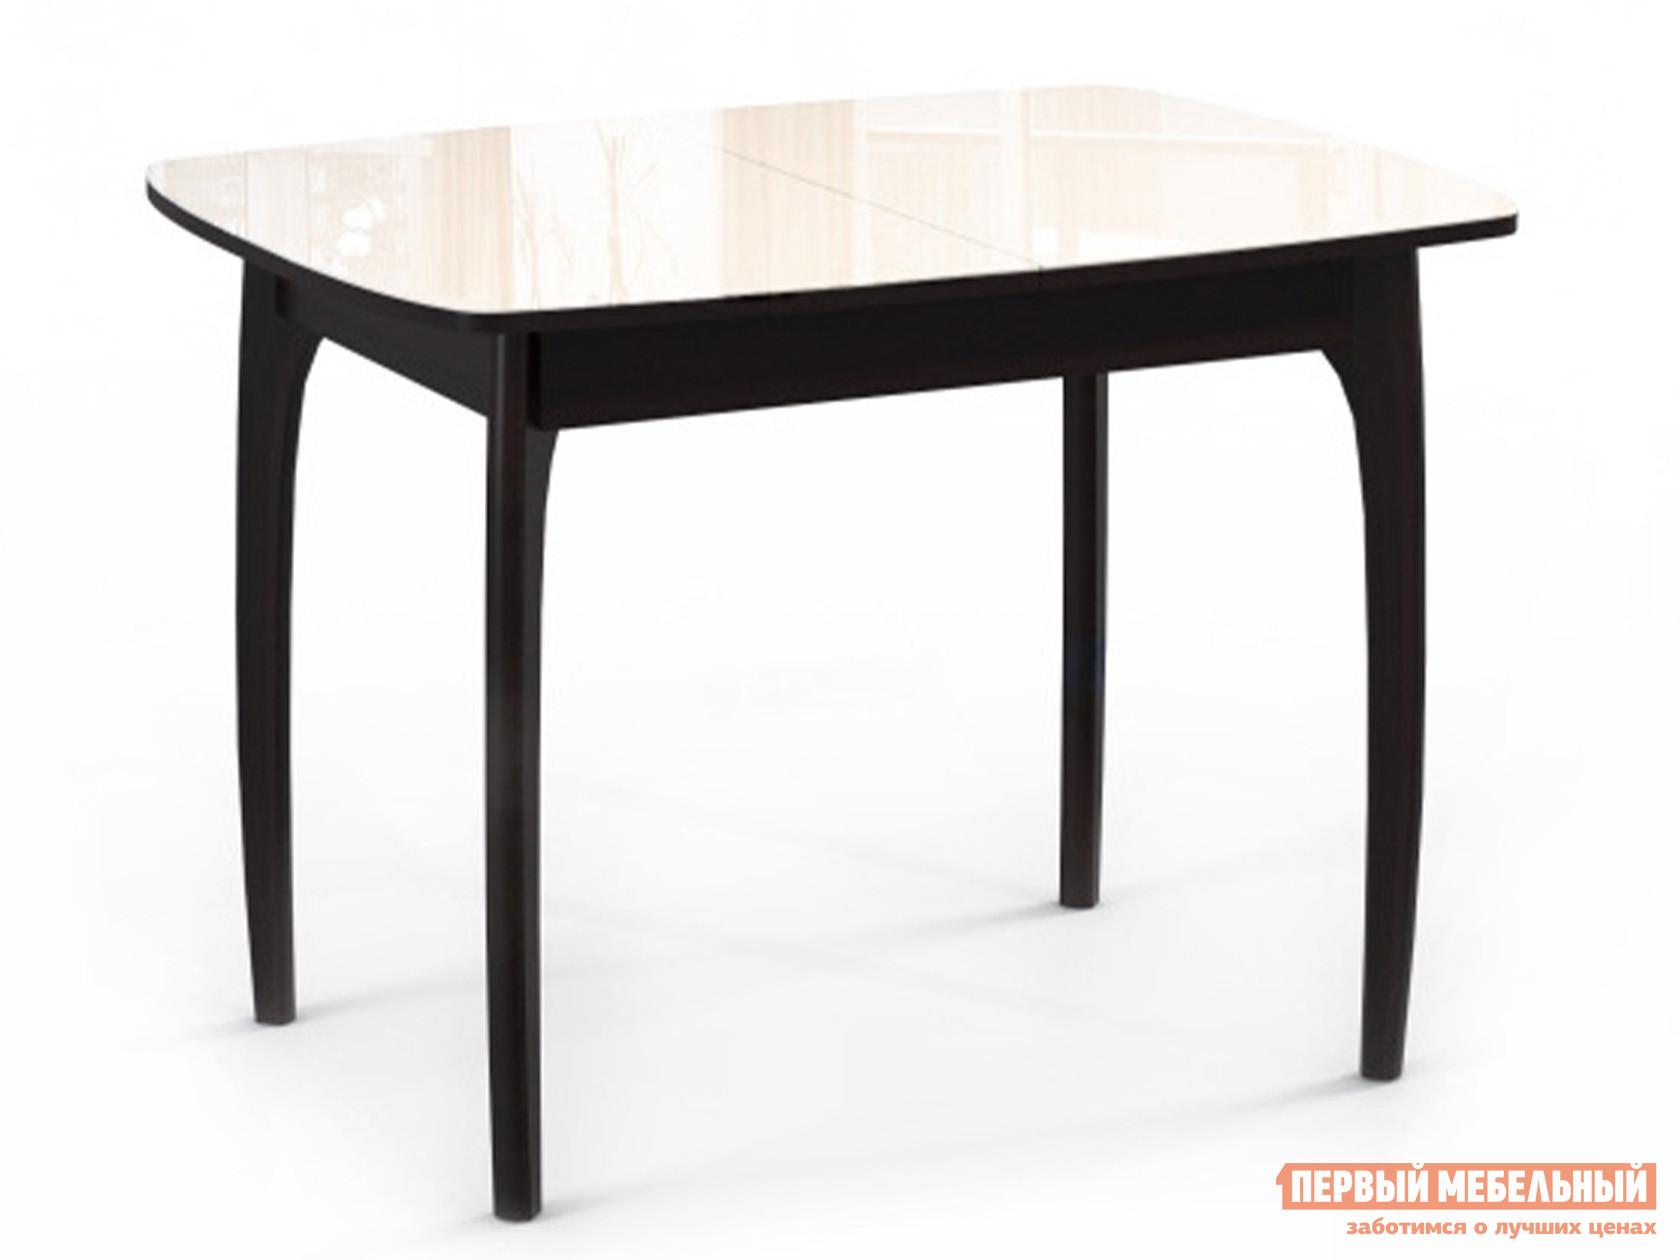 Обеденный стол  М15 ДН4 Венге / Стекло бежевое